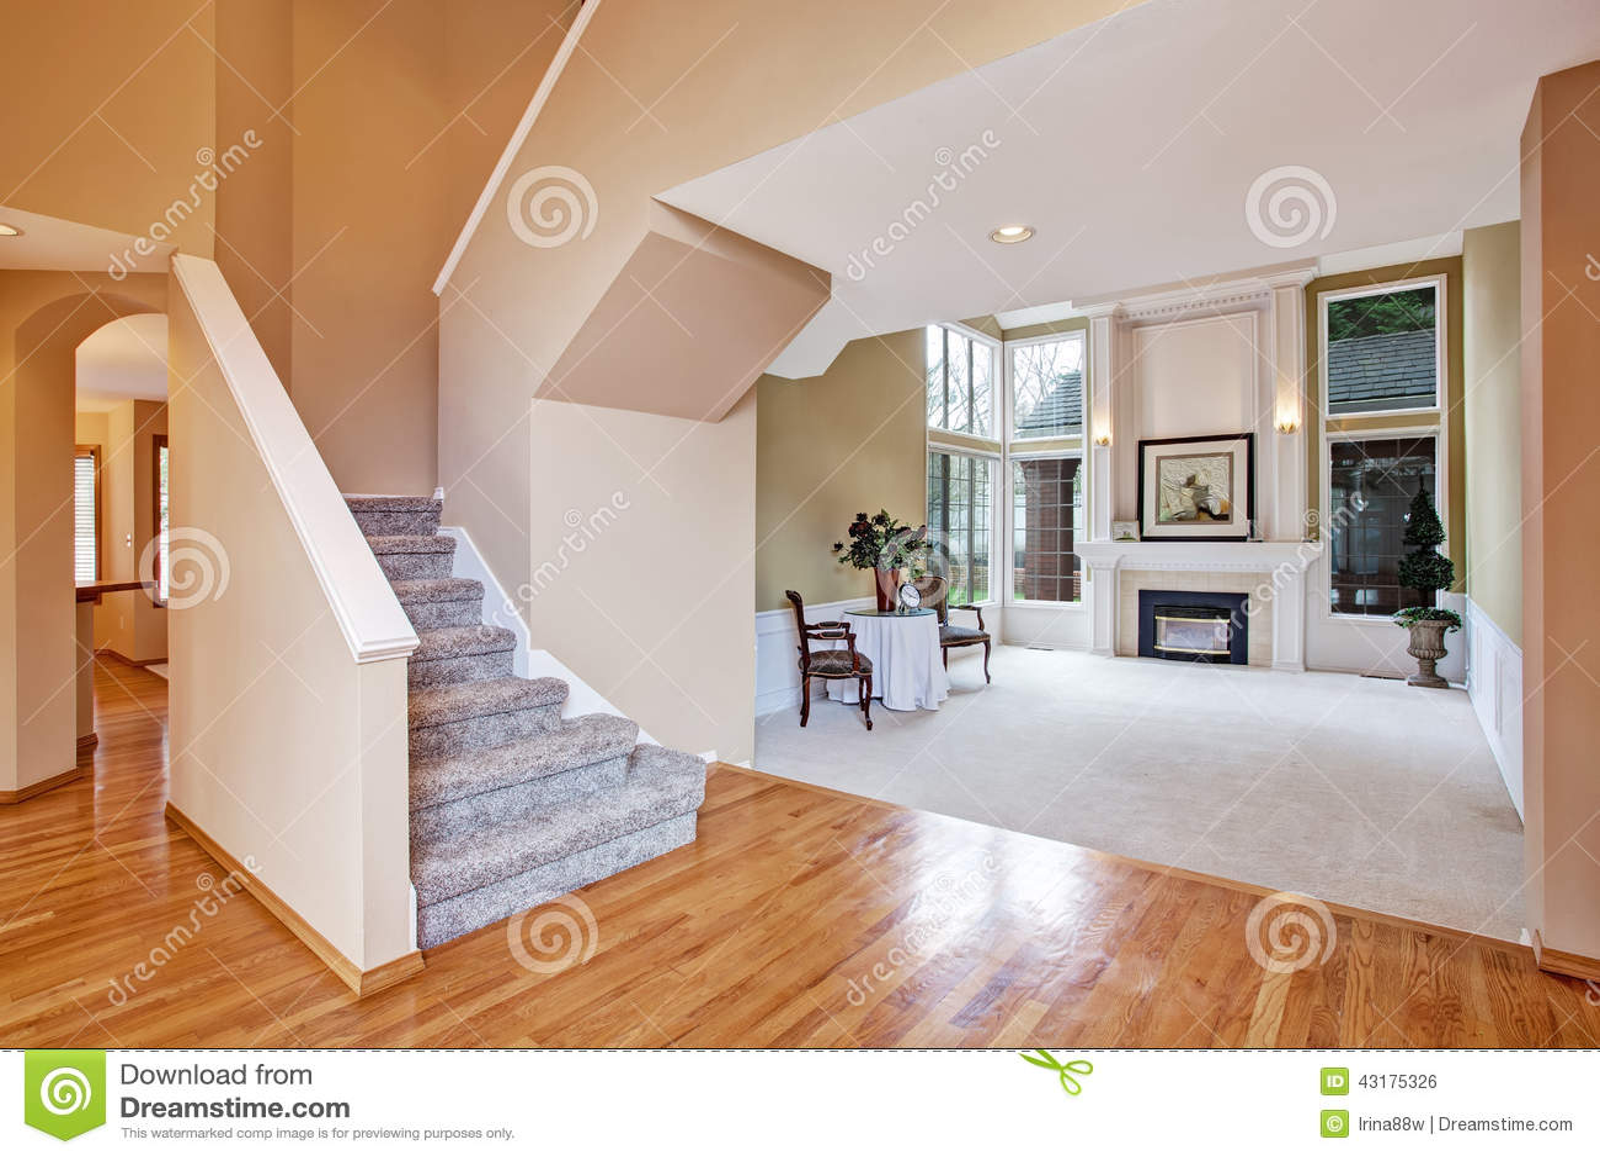 Luxury house interior living room and hallway stock photo for Luxury homes interior living room